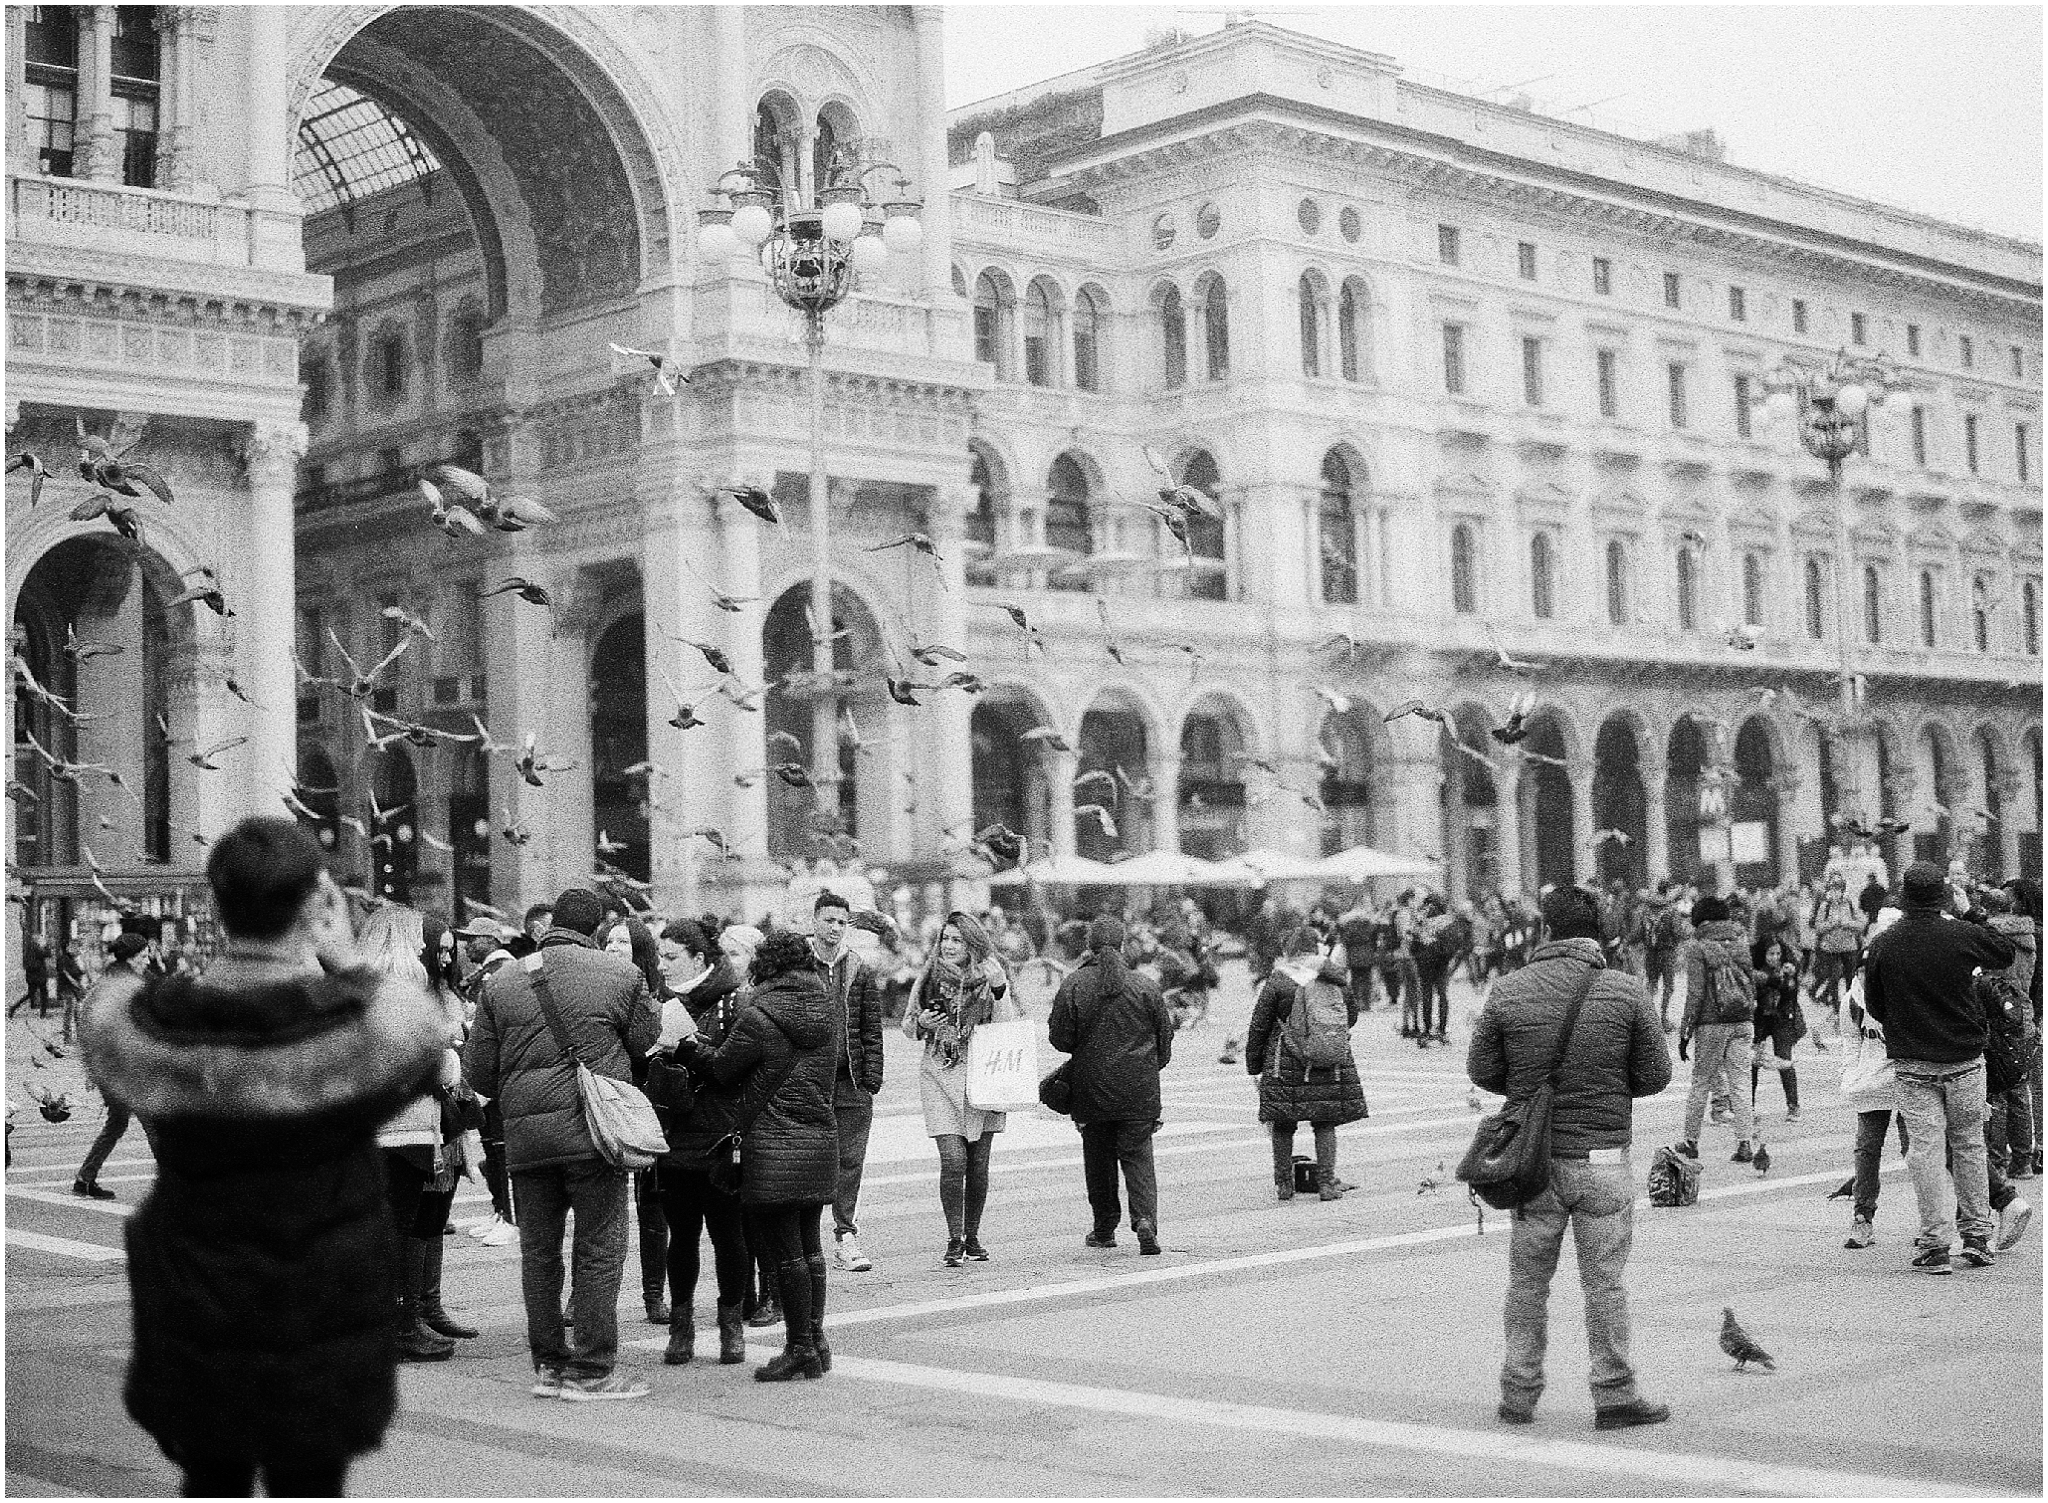 Vittorio-emanuele-ii-gallery